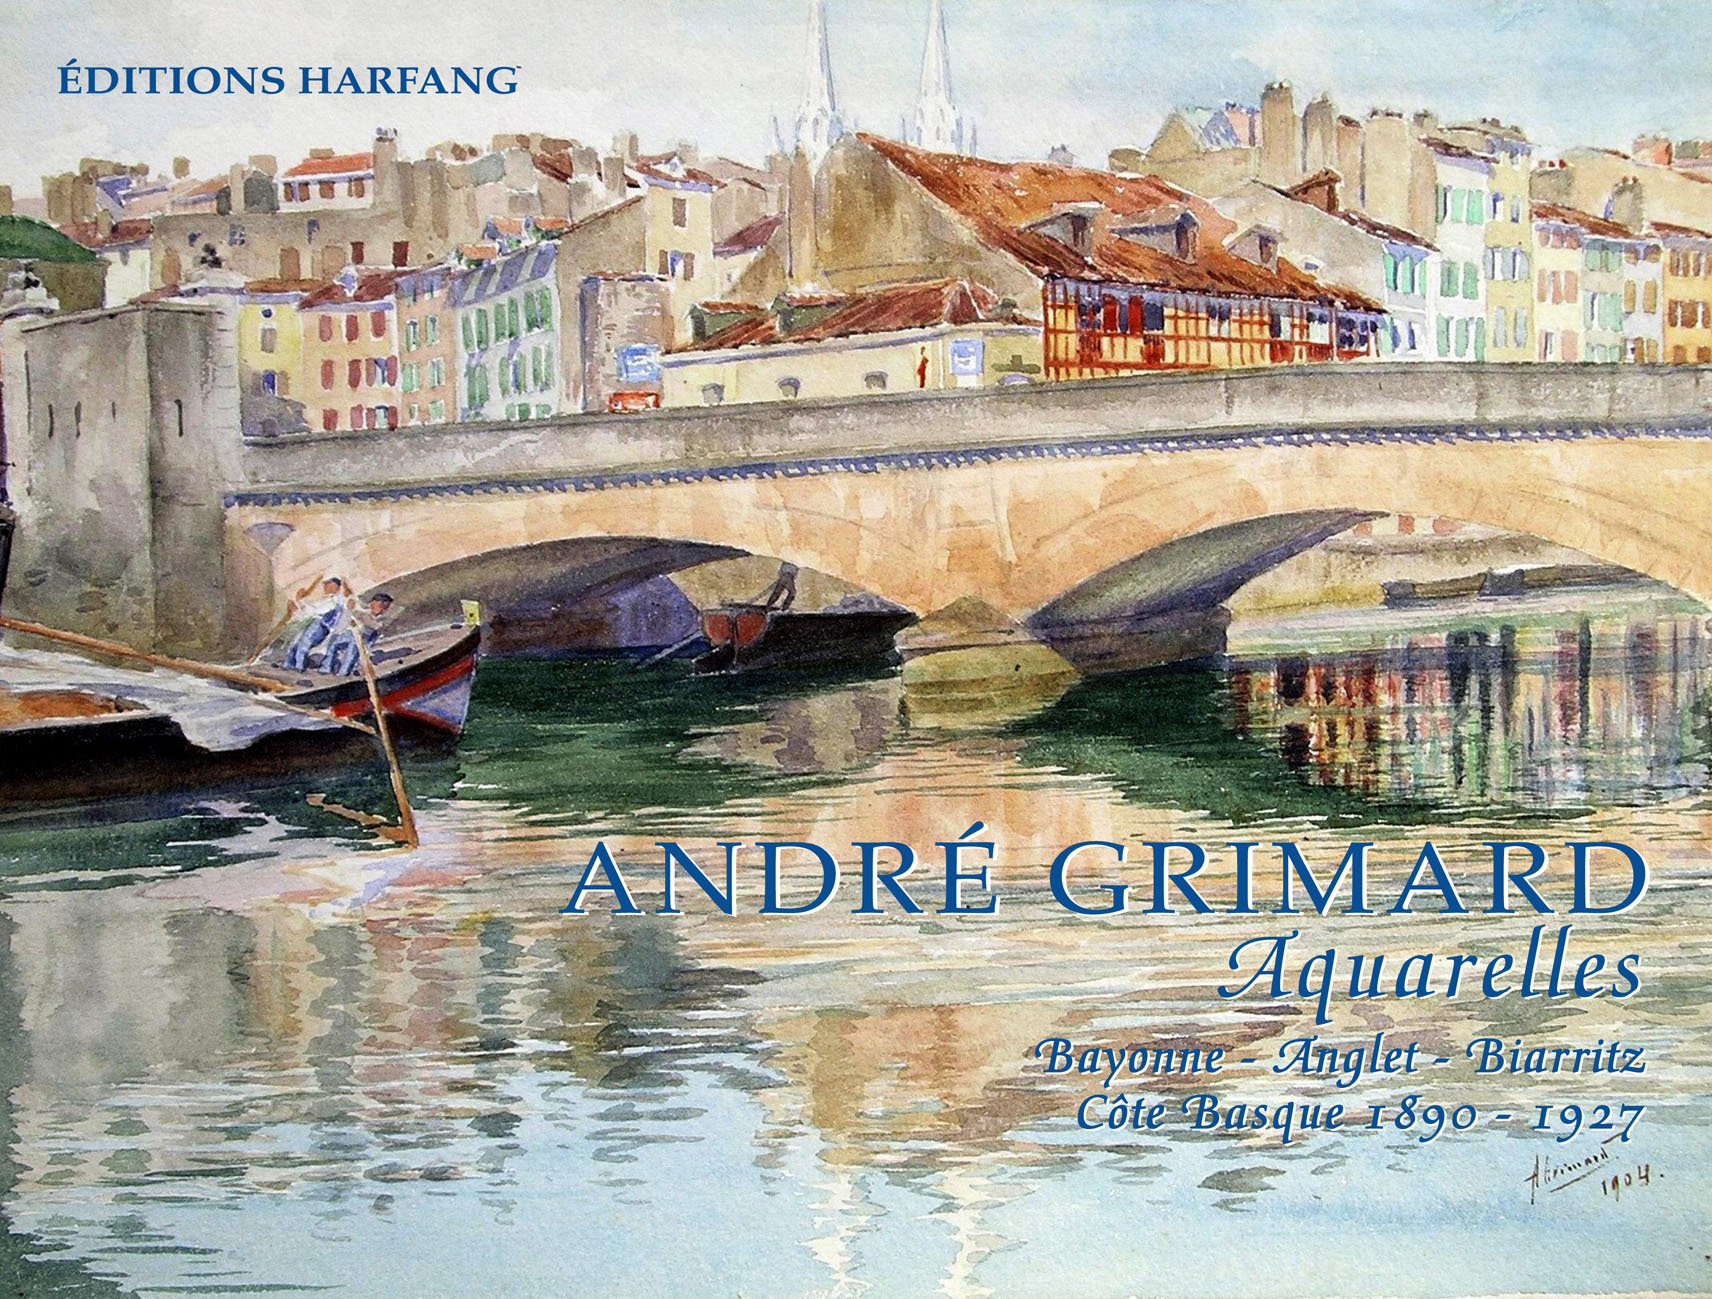 ANDRE GRIMARD : AQUARELLES BAYONNE - ANGLET- BIARRITZ - COTE BASQUE 1890-1927